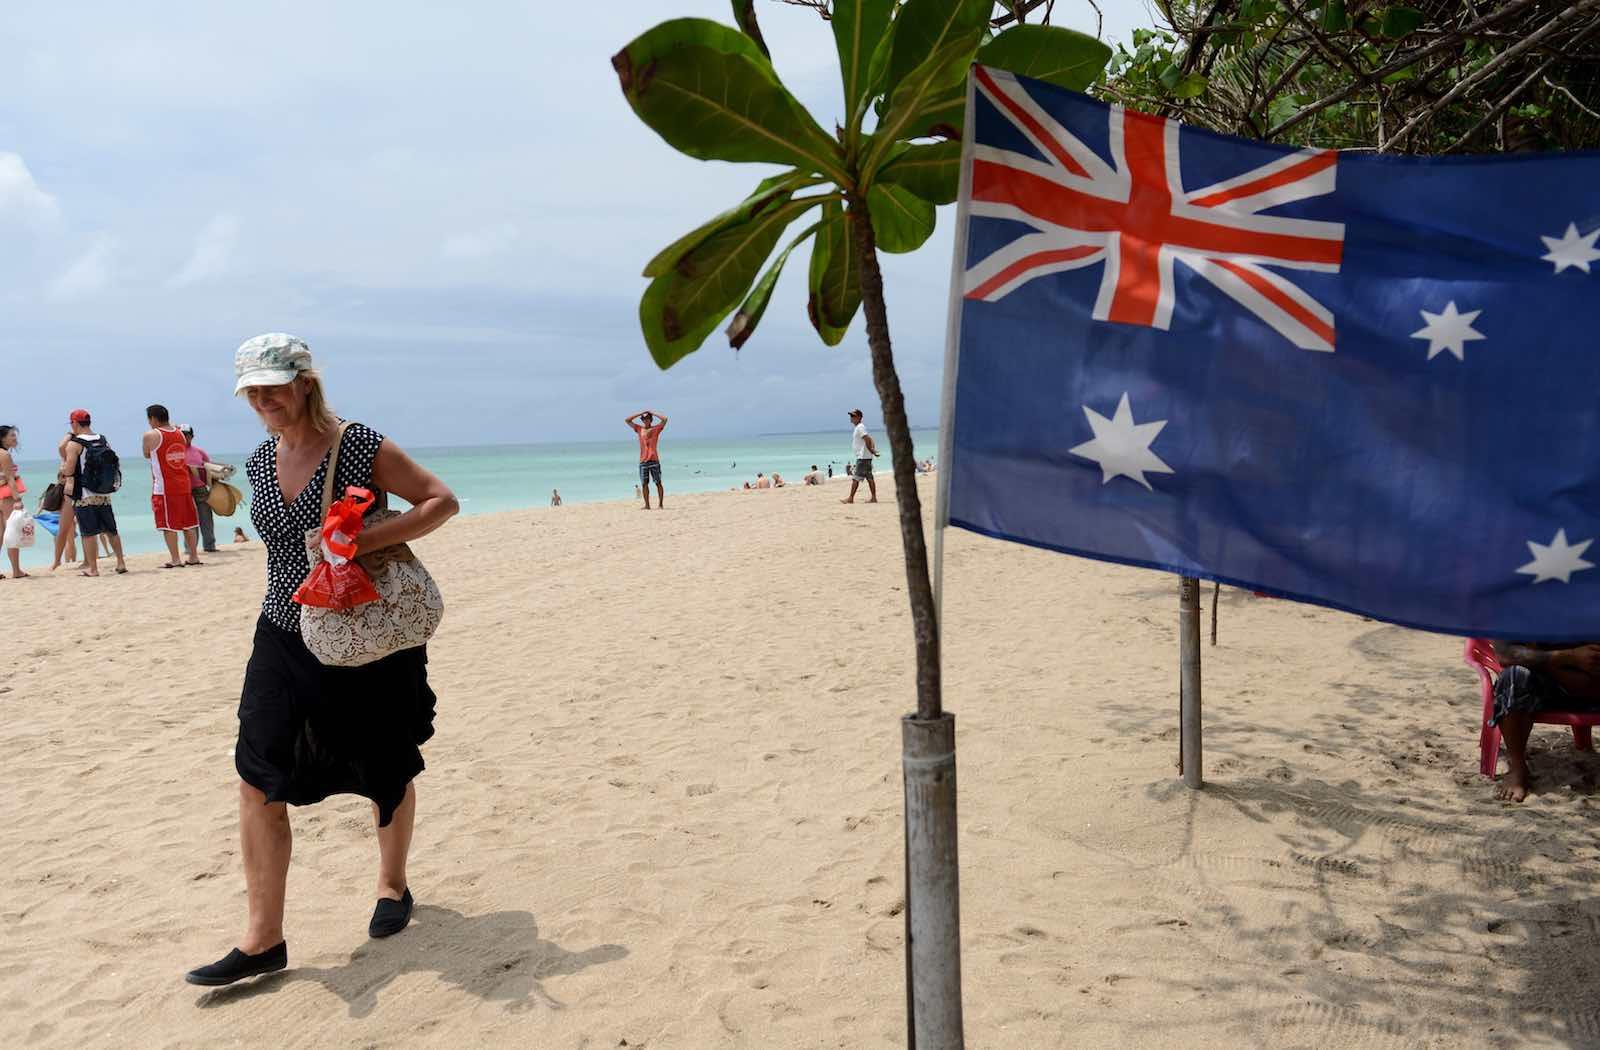 The soft sands of Kuta beach (Photo: Sonny Tumbelaka/AFP/Getty Images)